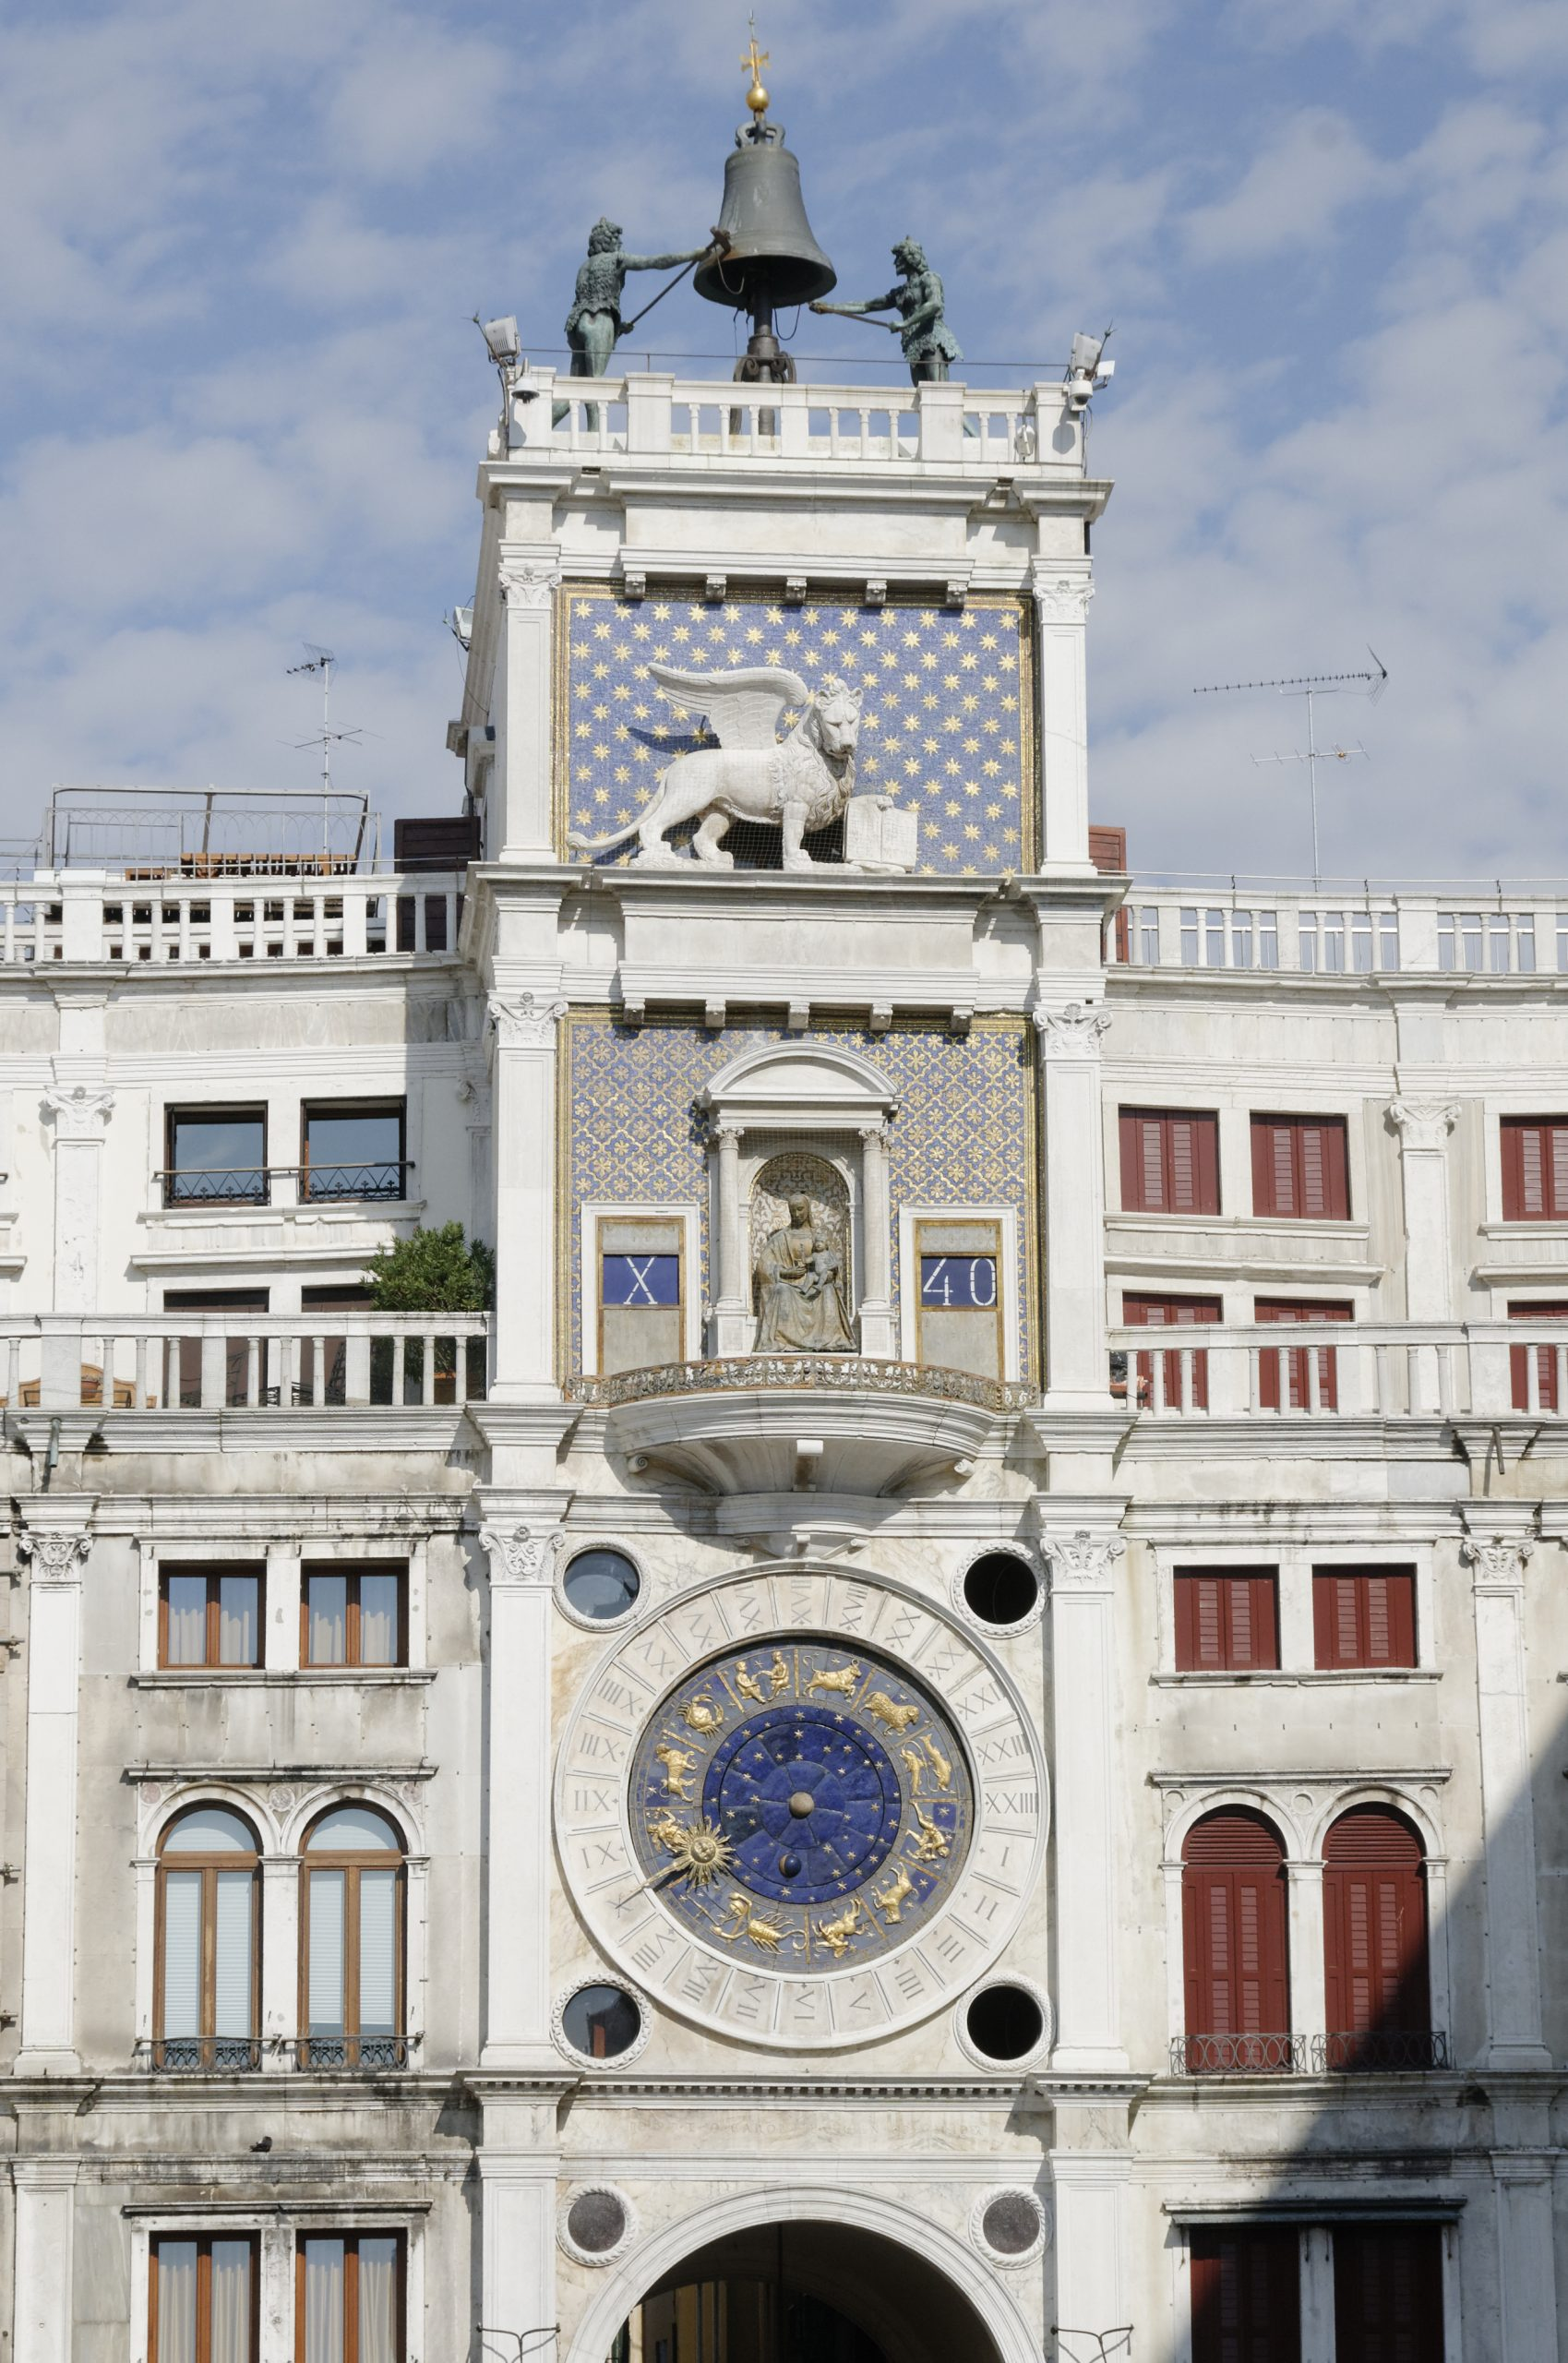 Torre dell' Orologio - Sheet1